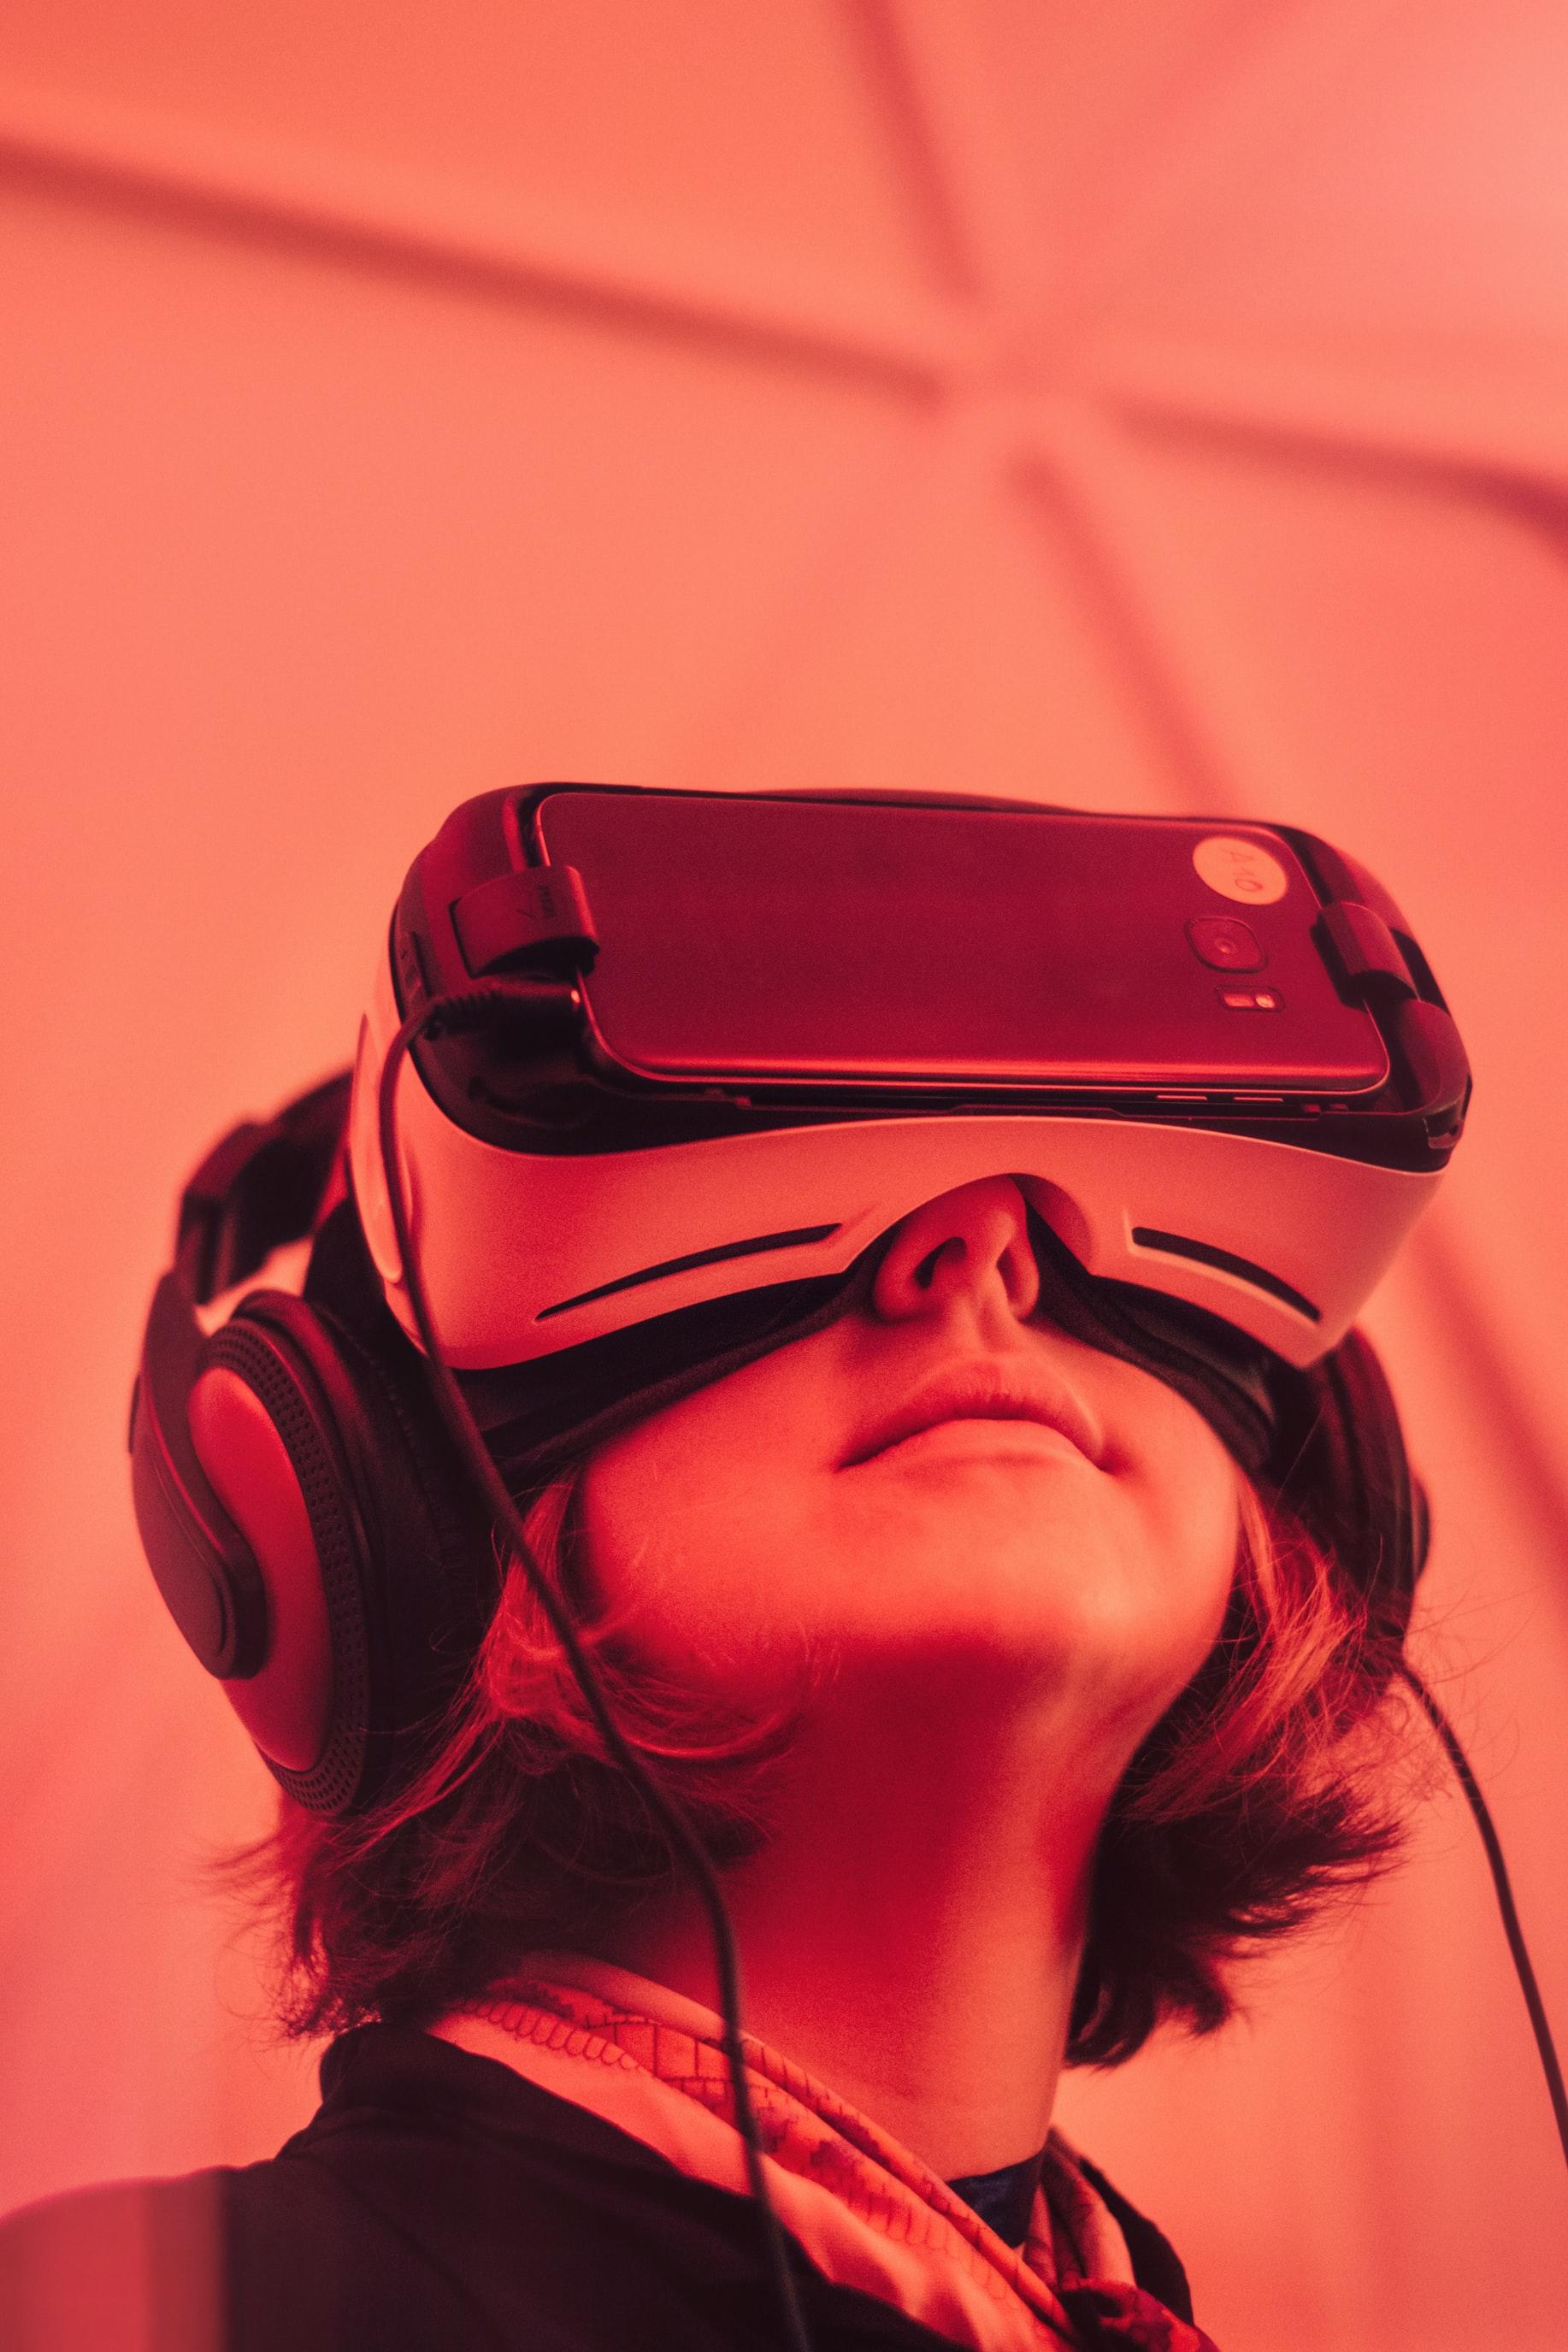 Tech-Trends: Virtual Reality